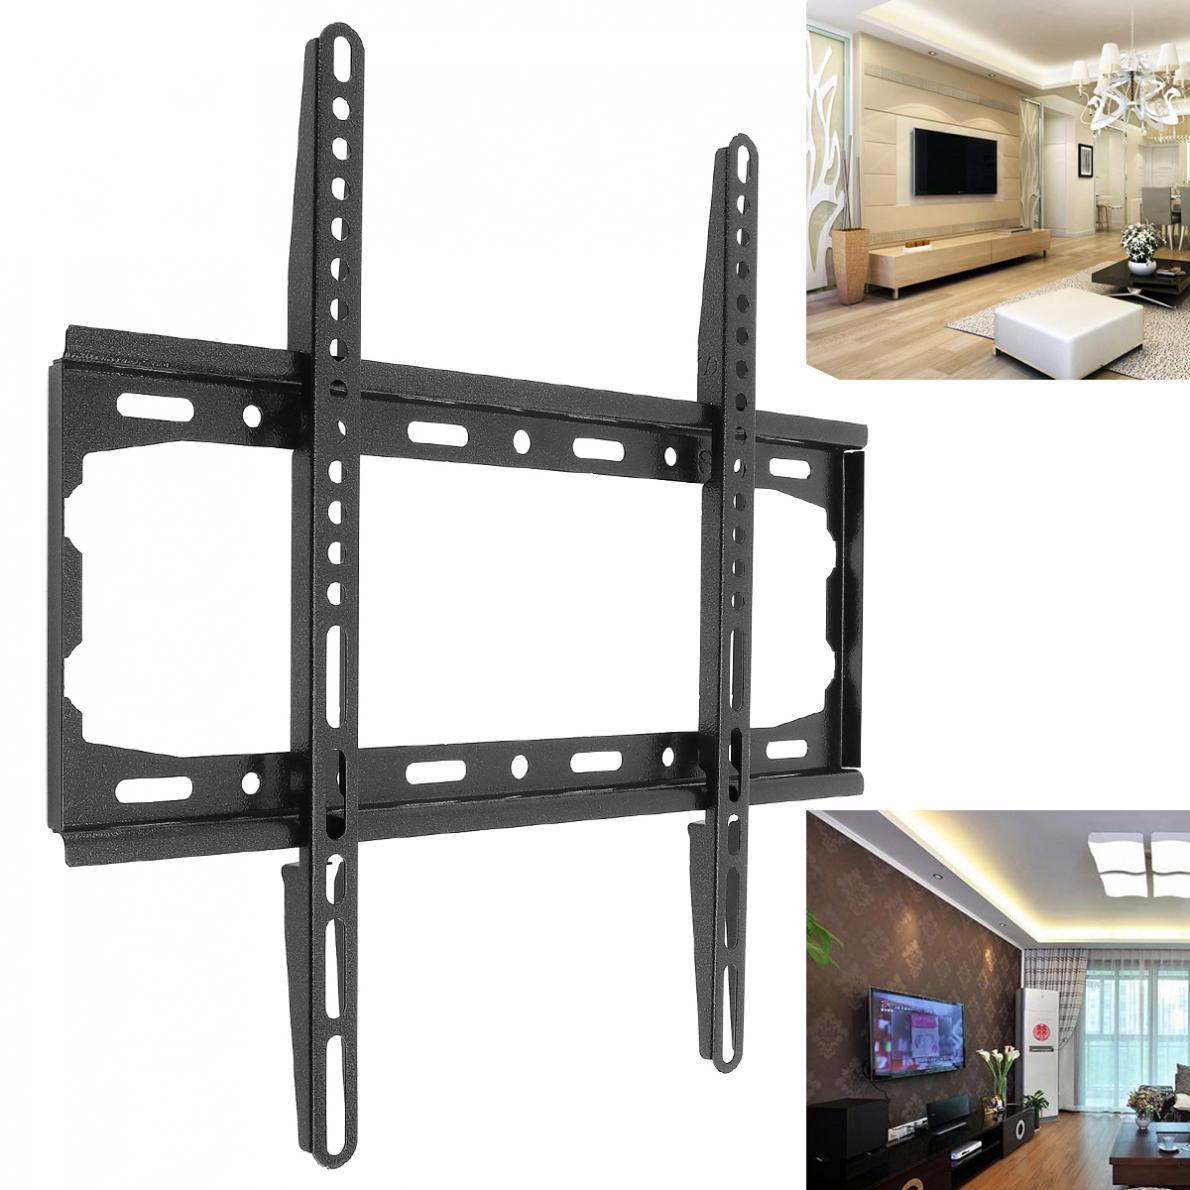 Universal 25KG/35KG/50KG TV Wall Mount Bracket Fixed Flat Panel TV Frame for 12 - 37 / 26 - 60 Inch LCD LED Monitor Flat Panel